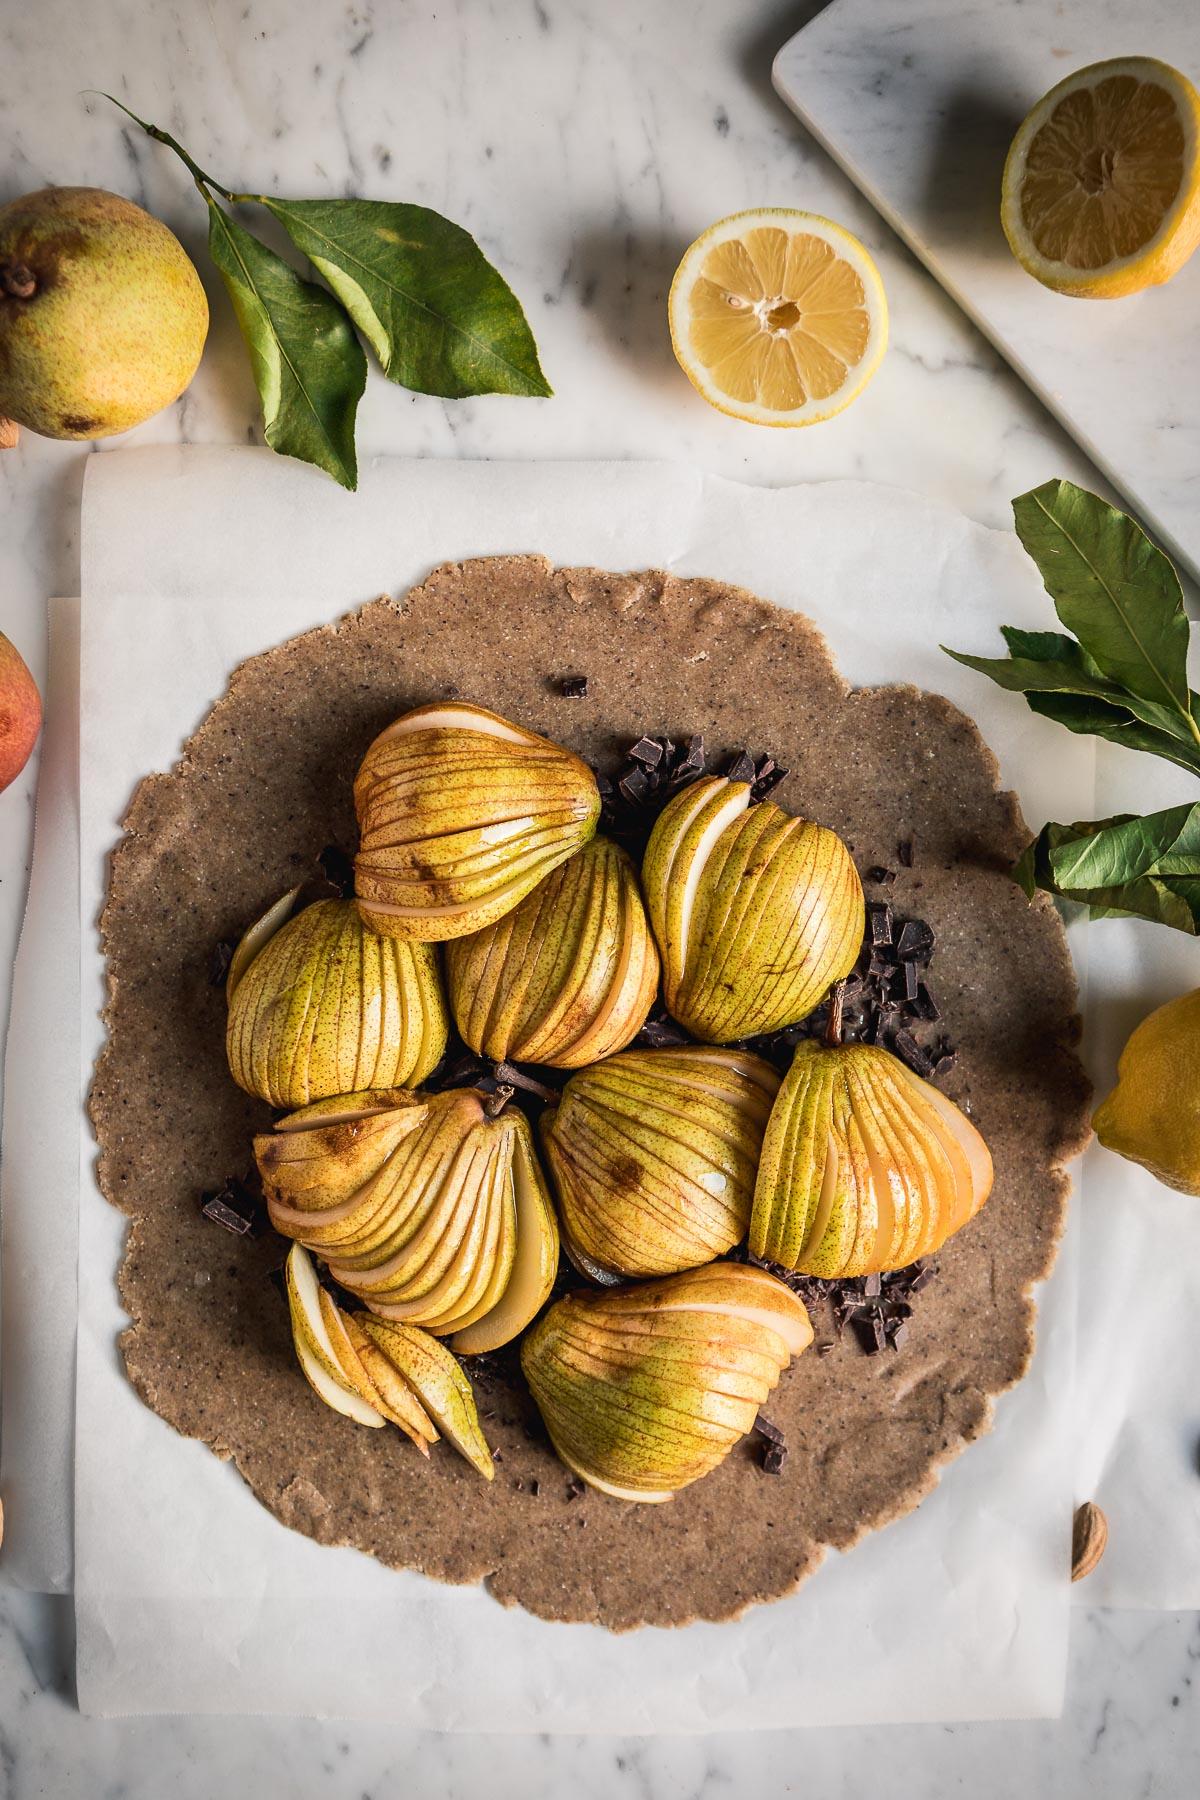 Buckwheat Almond Vegan Chocolate Pear Galette #glutenfree tart recipe pasta frolla senza glutine vegan Galette al cioccolato e pere vegan senza glutine con grano saraceno e mandorle #pear #chocolate